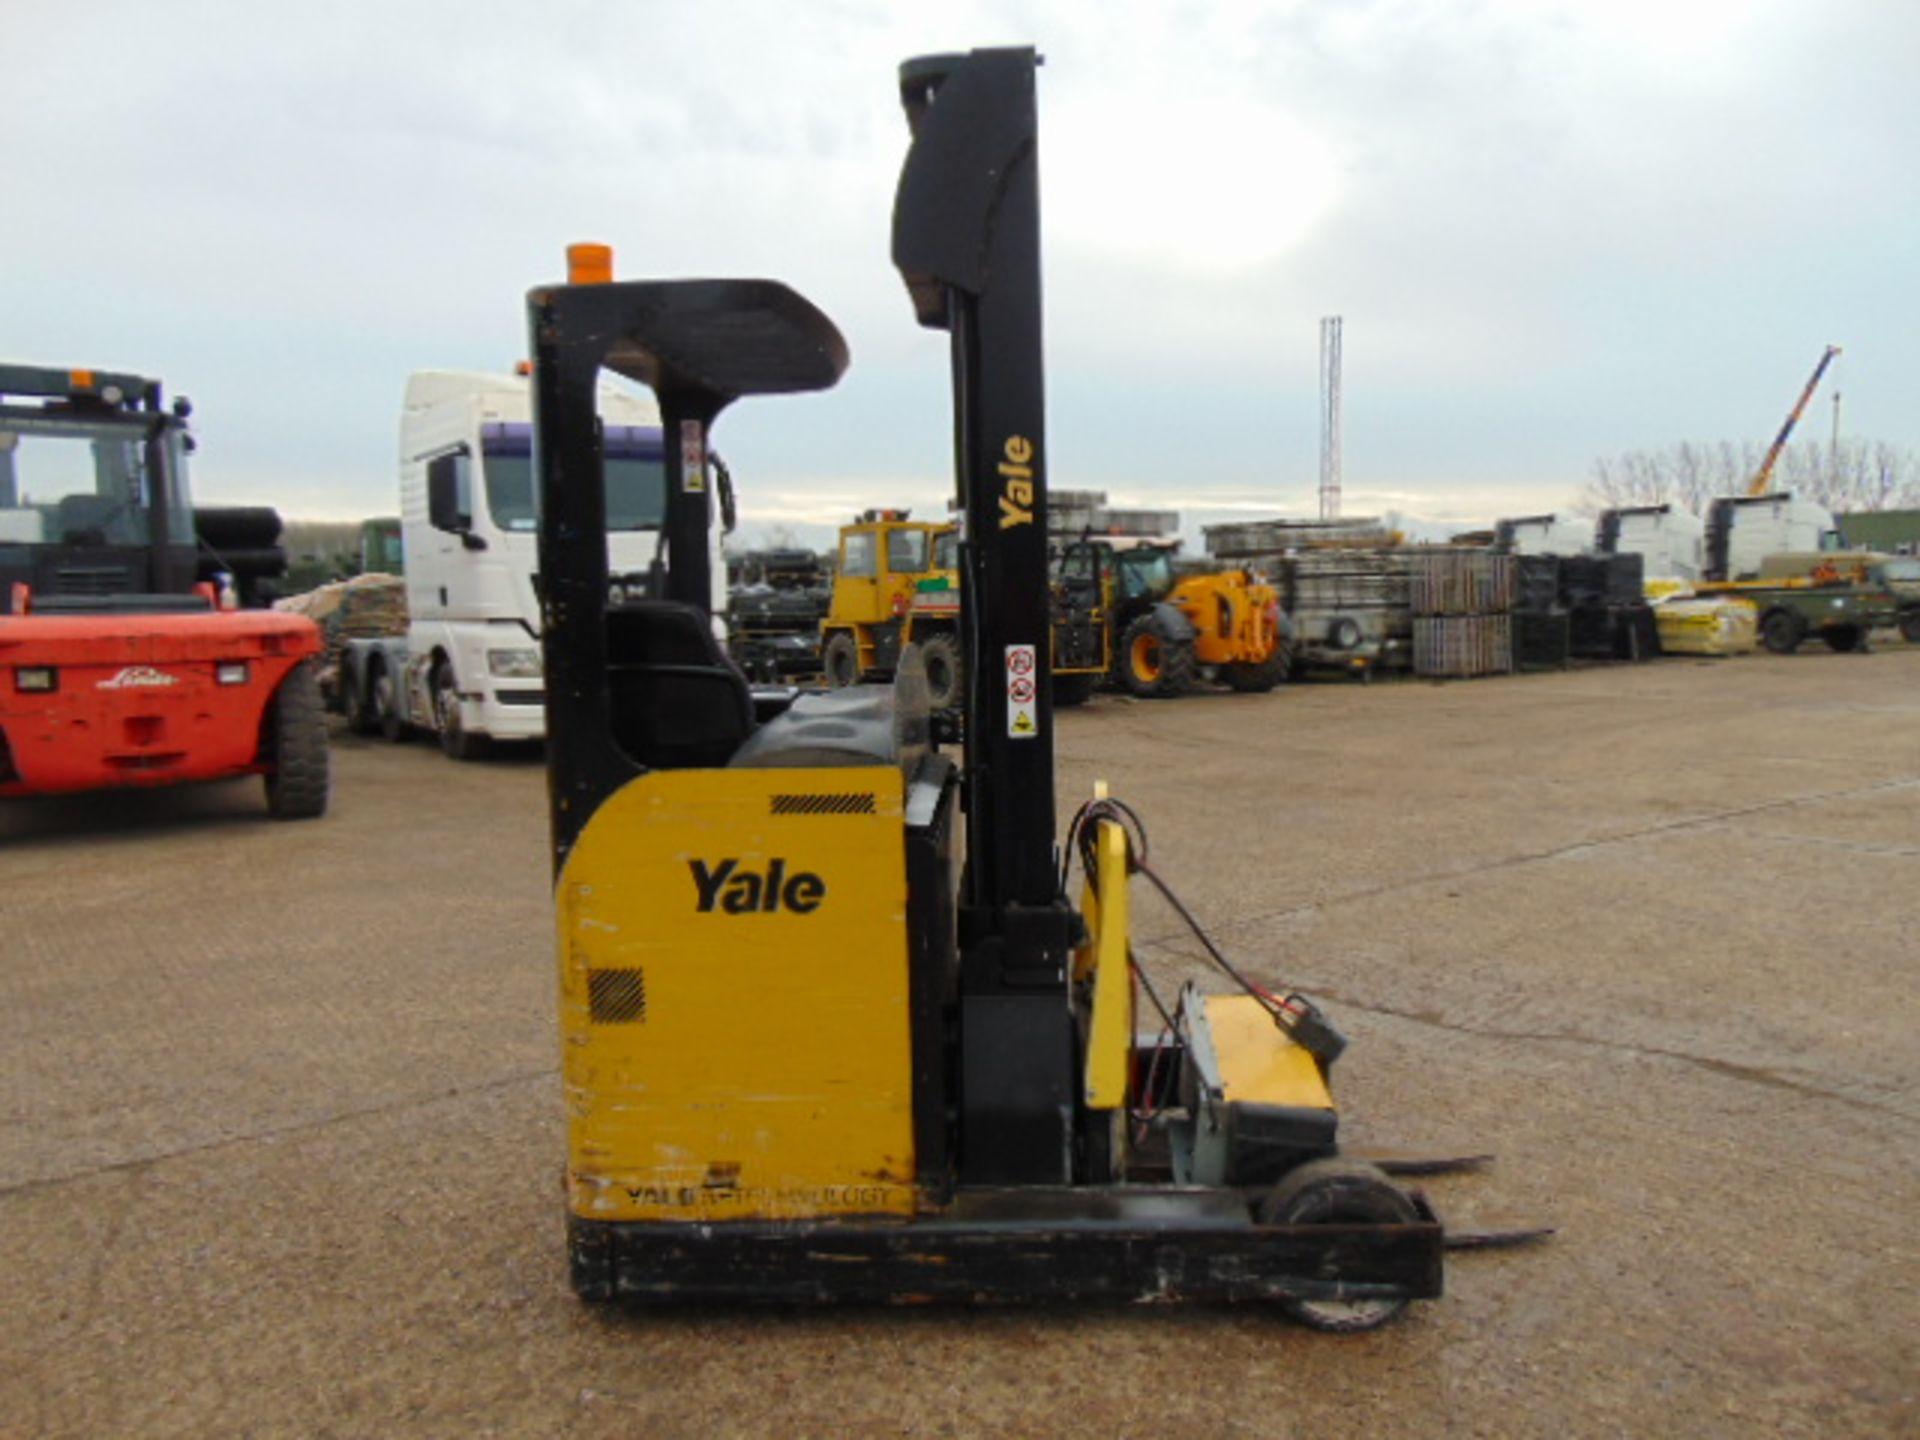 Lot 4 - Yale MR16 Electric Reach Fork Lift Truck